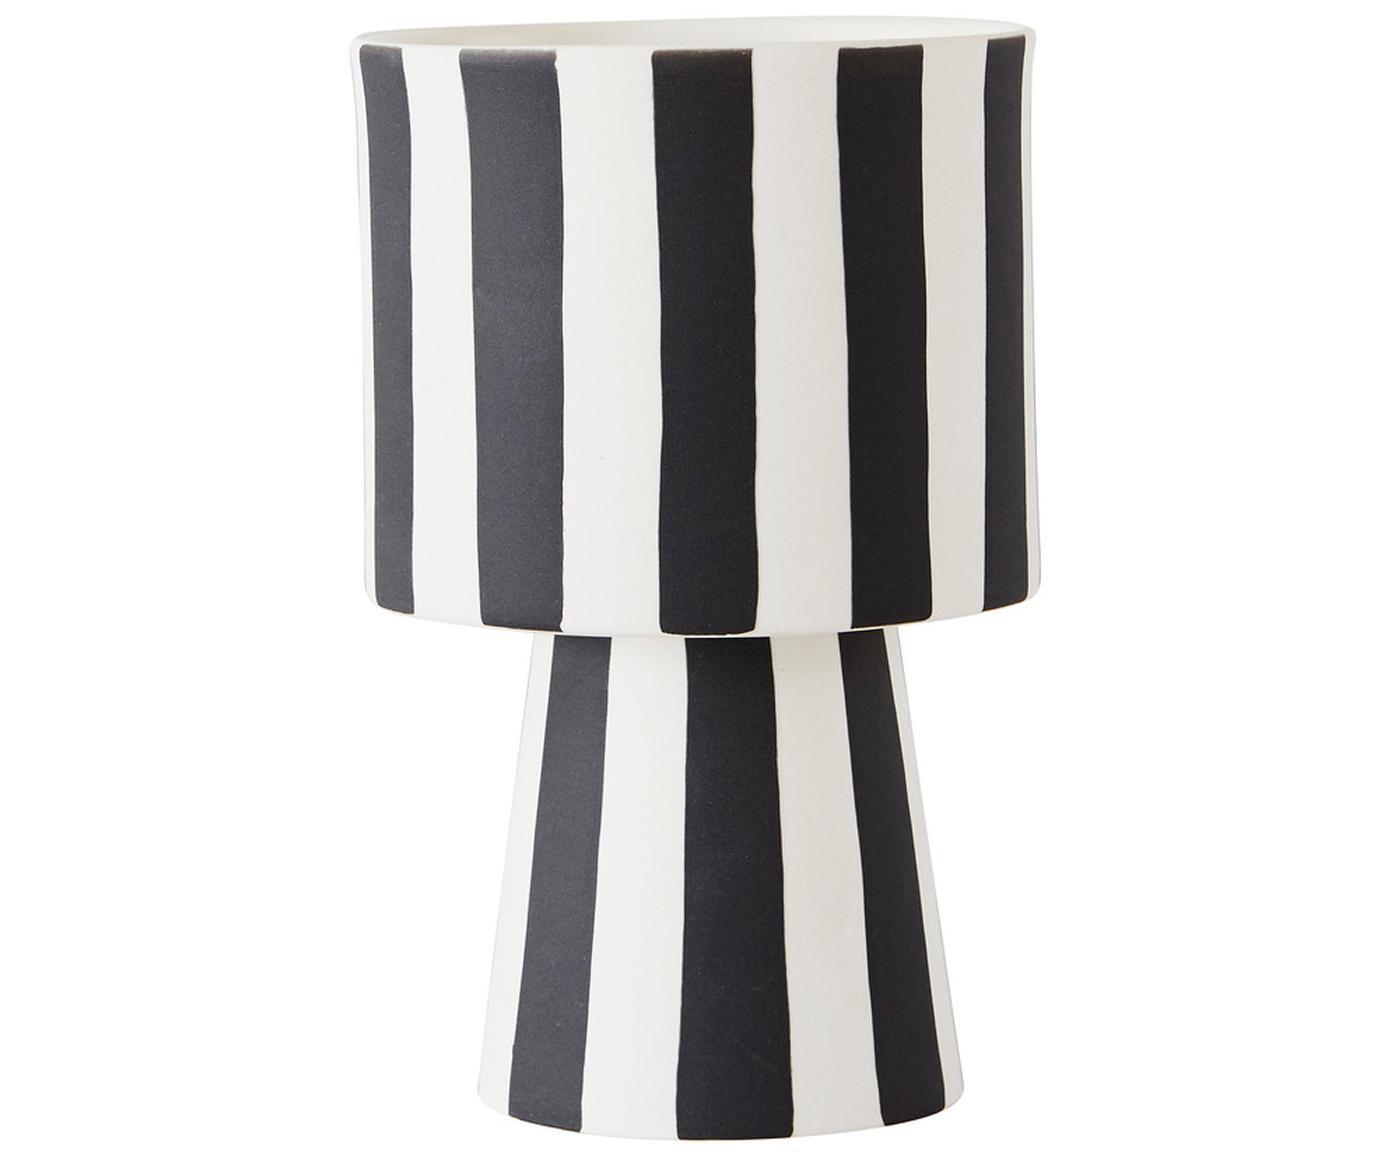 Handgefertigter Übertopf Toppu, Keramik, Weiß, Schwarz, Ø 10 x H 15 cm